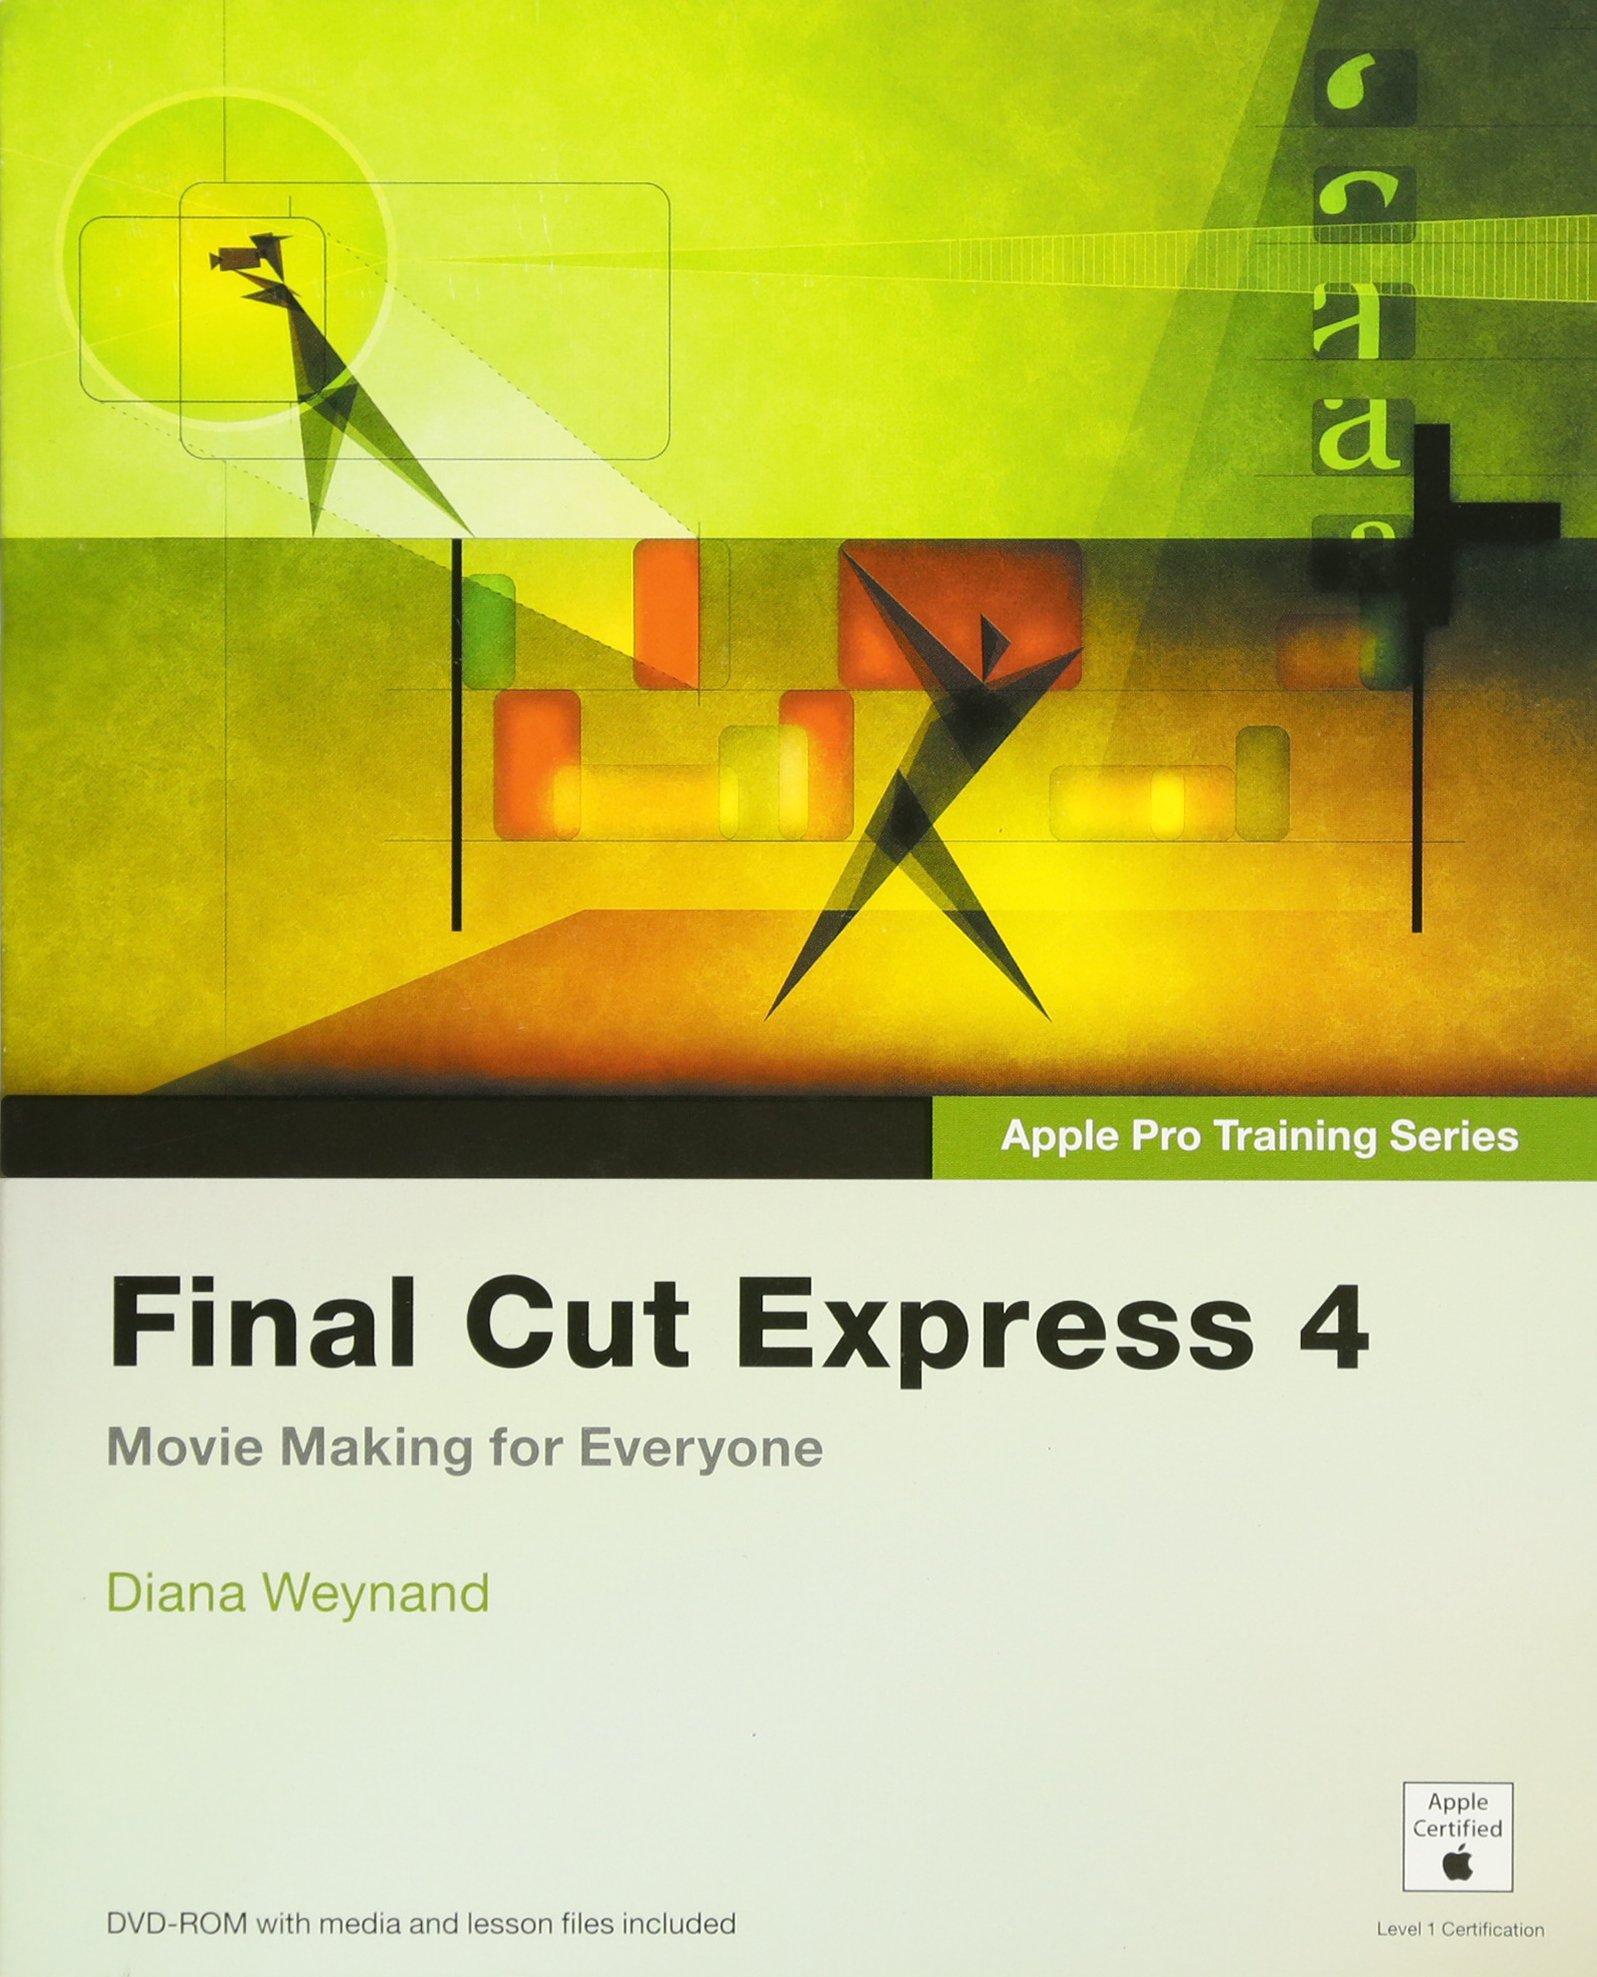 Apple Pro Training Series Final Cut Express 4 Diana Weynand